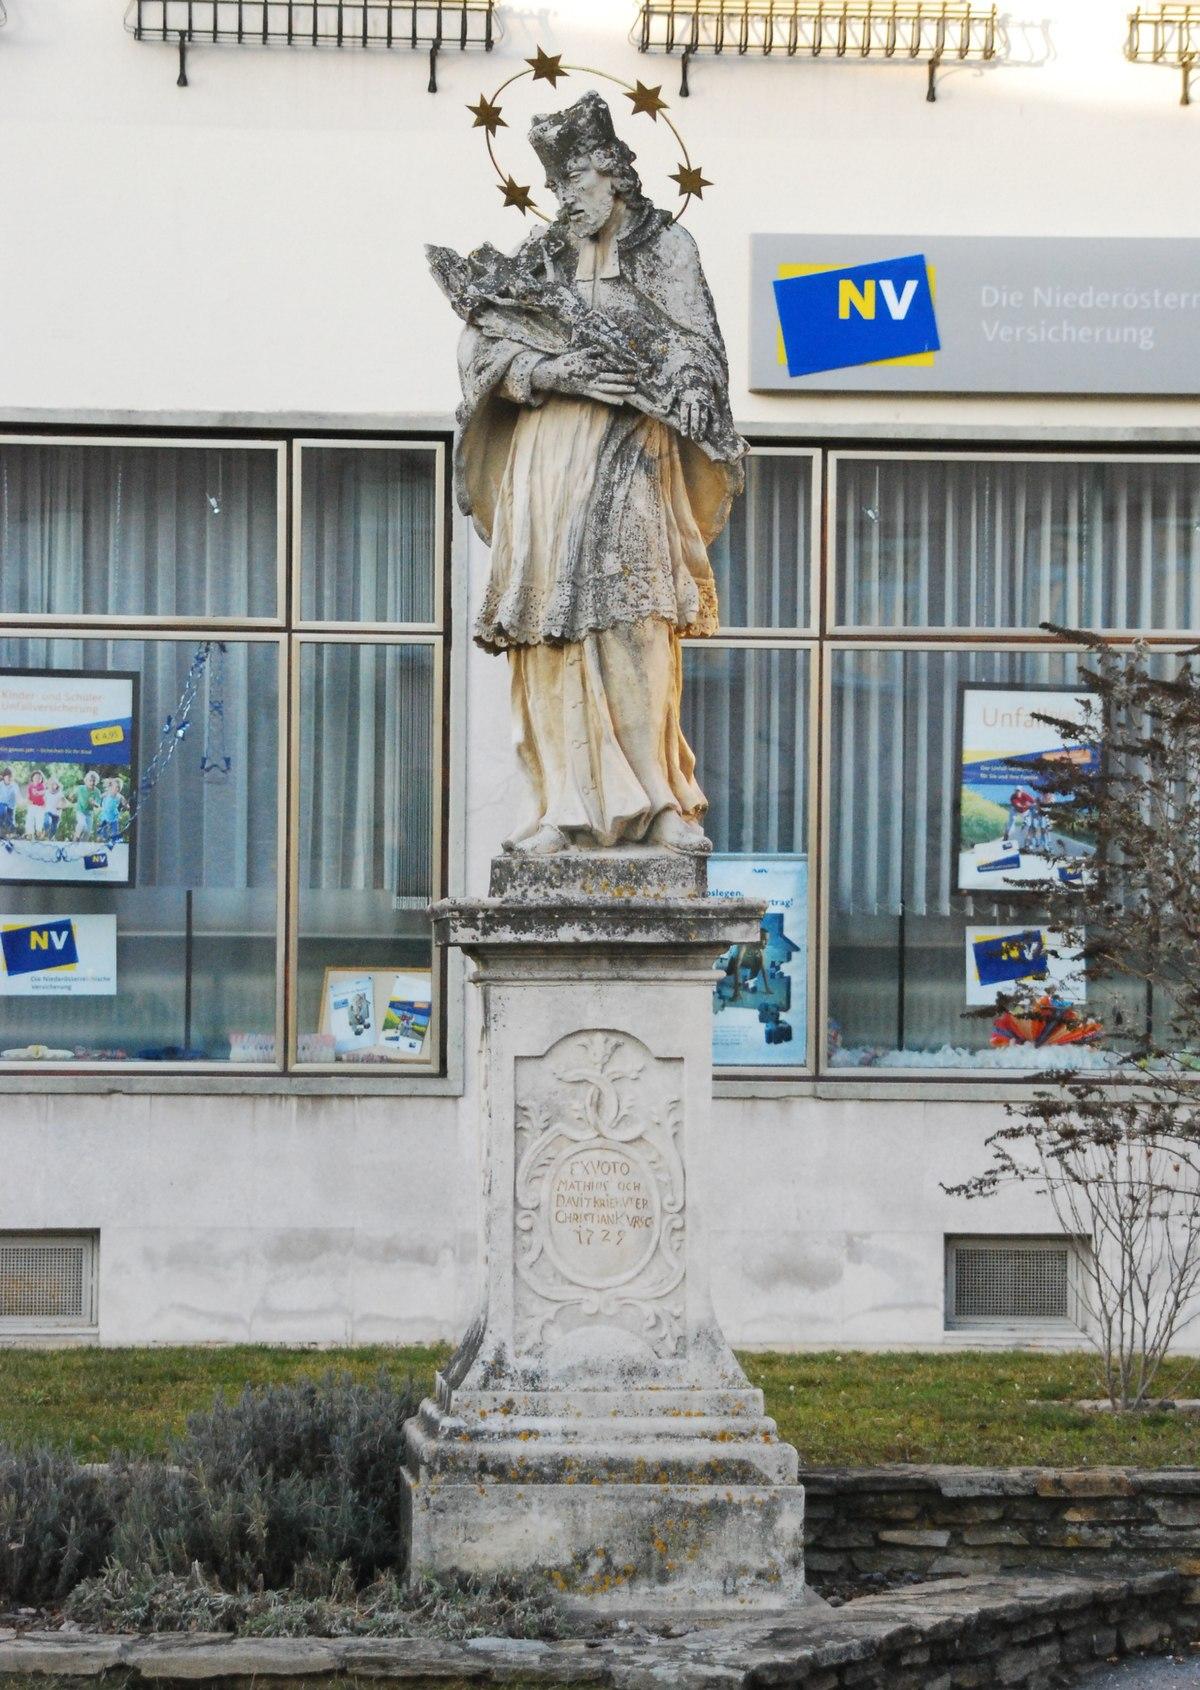 Landjugend Zistersdorf - Home